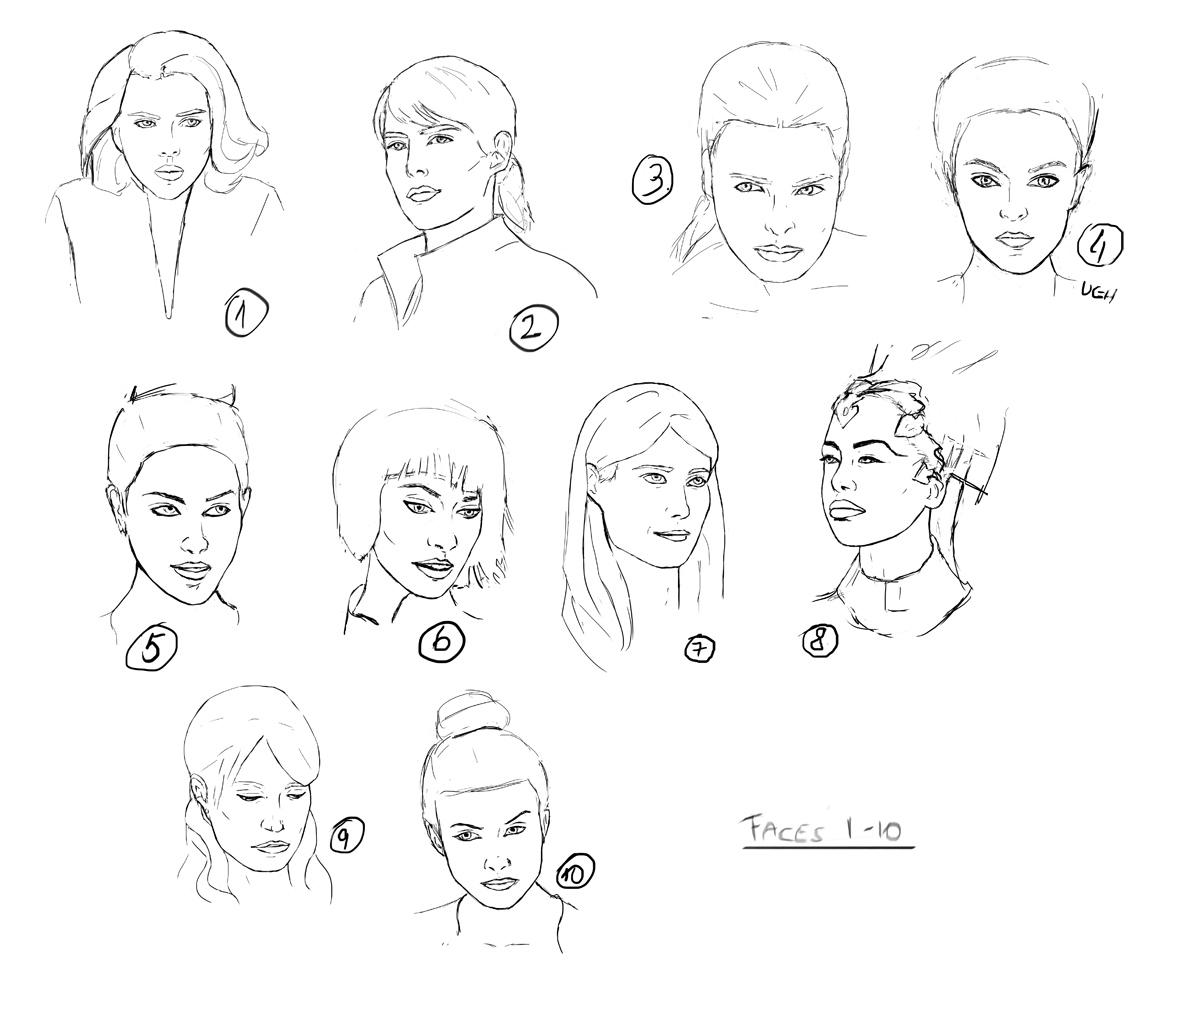 [Image: Fem_Faces_0-10.jpg]